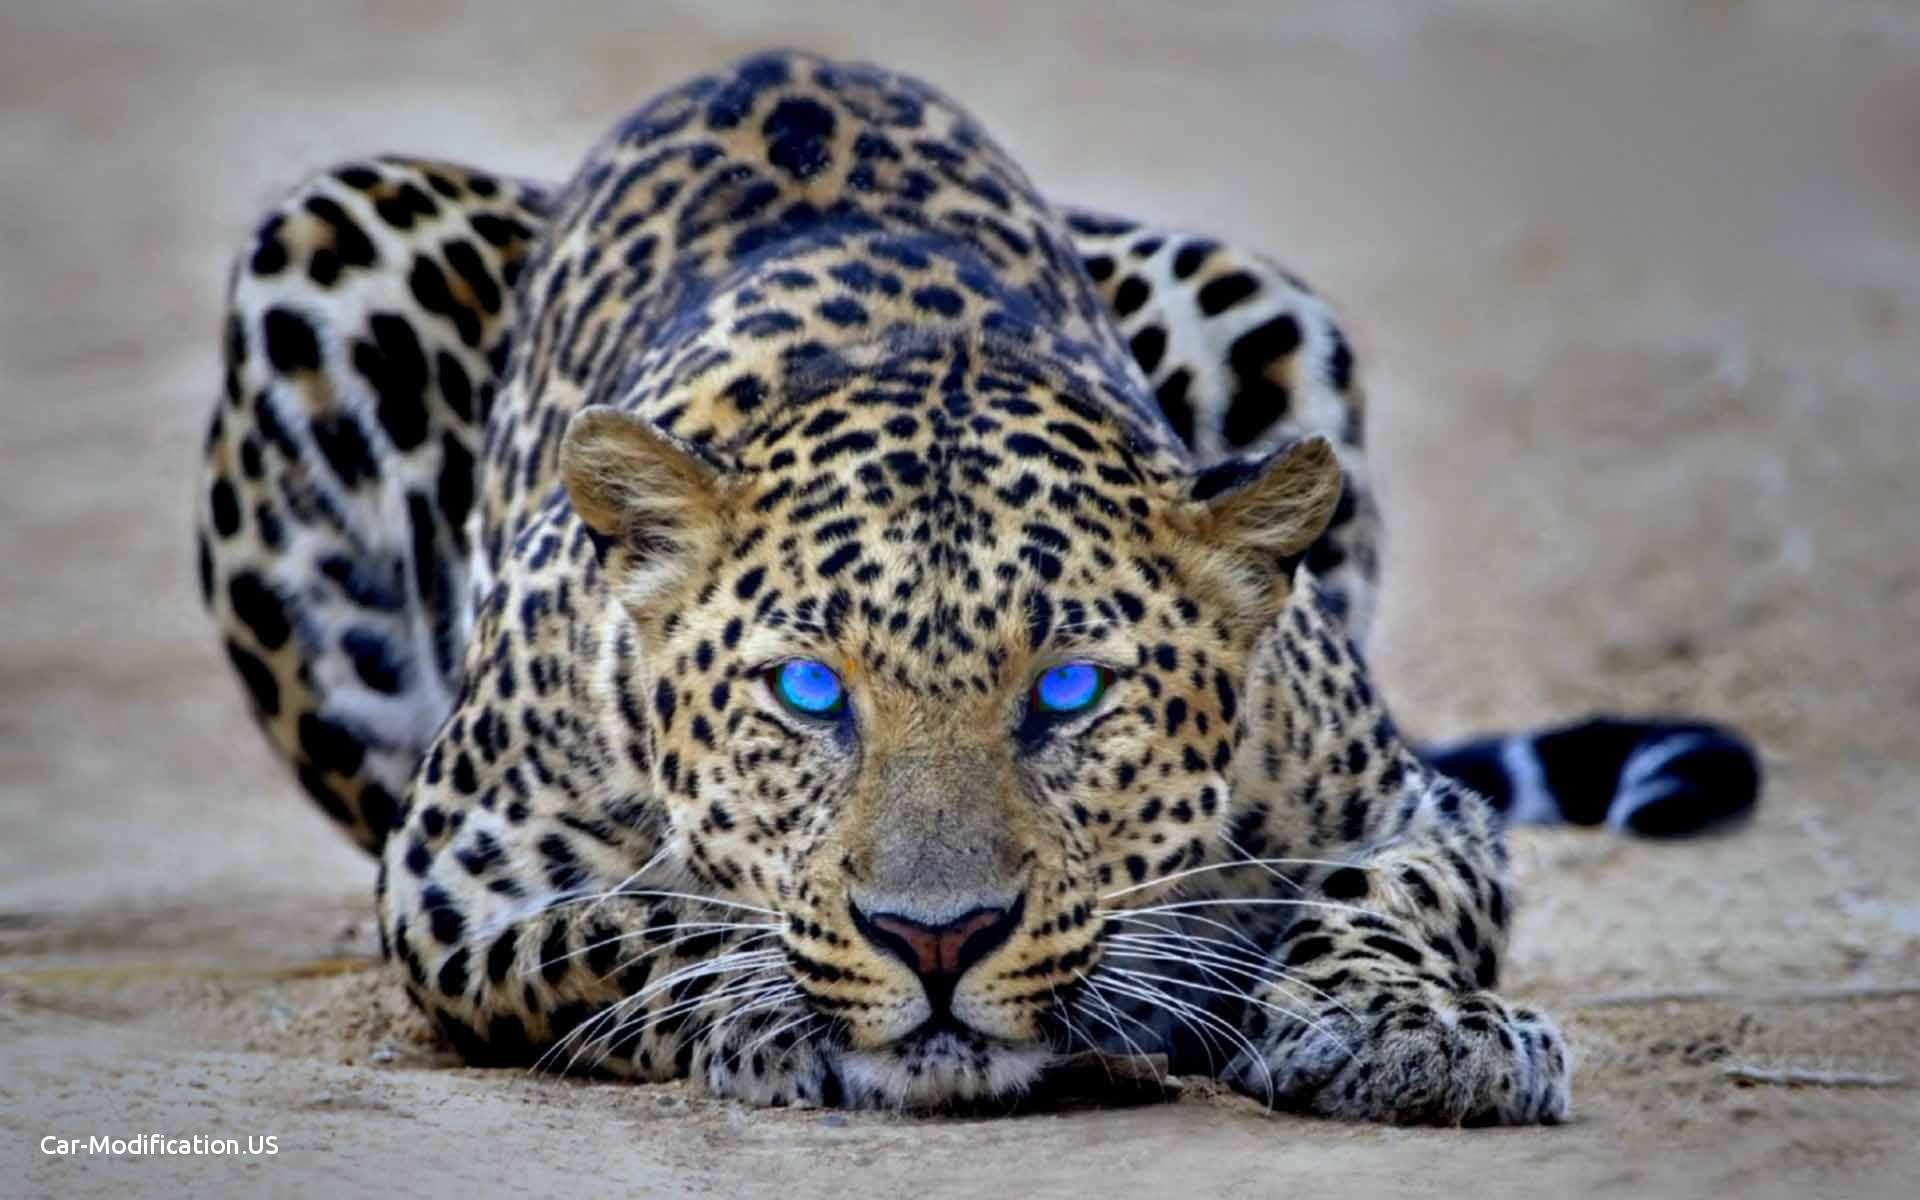 Jaguar Animal Wallpaper Posted By Ryan Mercado